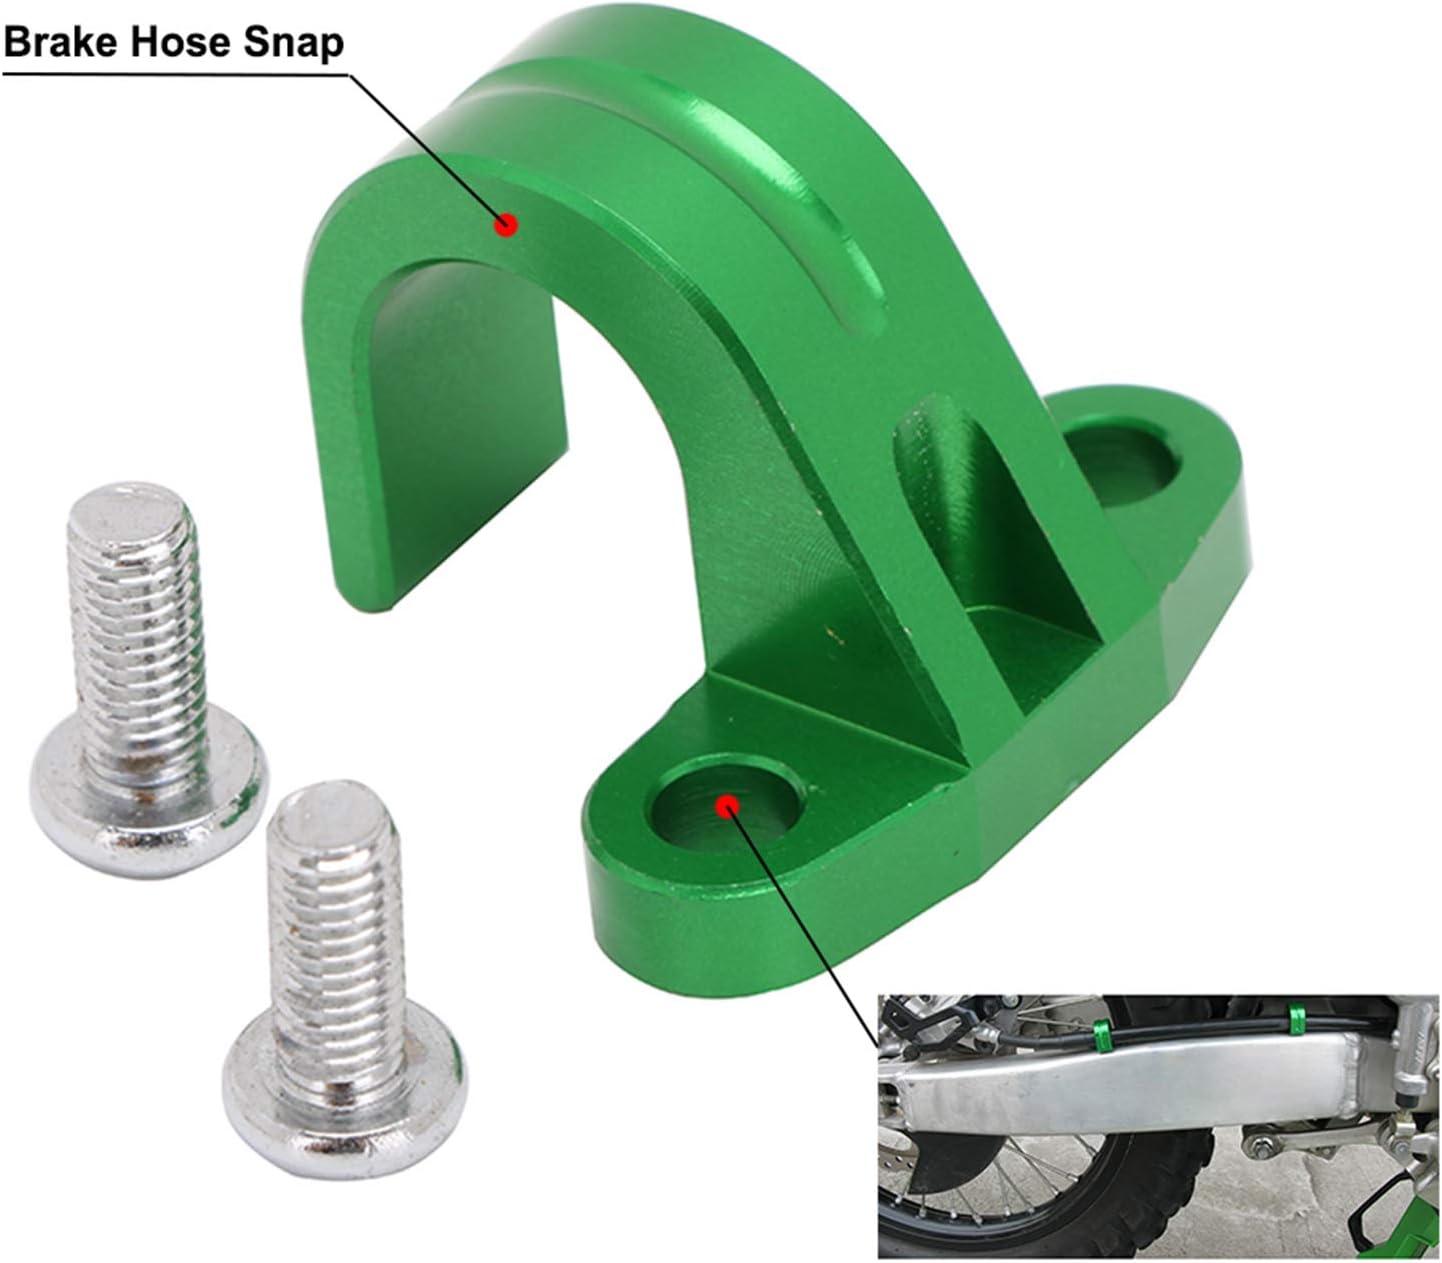 Motorcycle Rear Brake Line Hose Snap Clamp CNC For Kawasaki KX250F KX450F Green